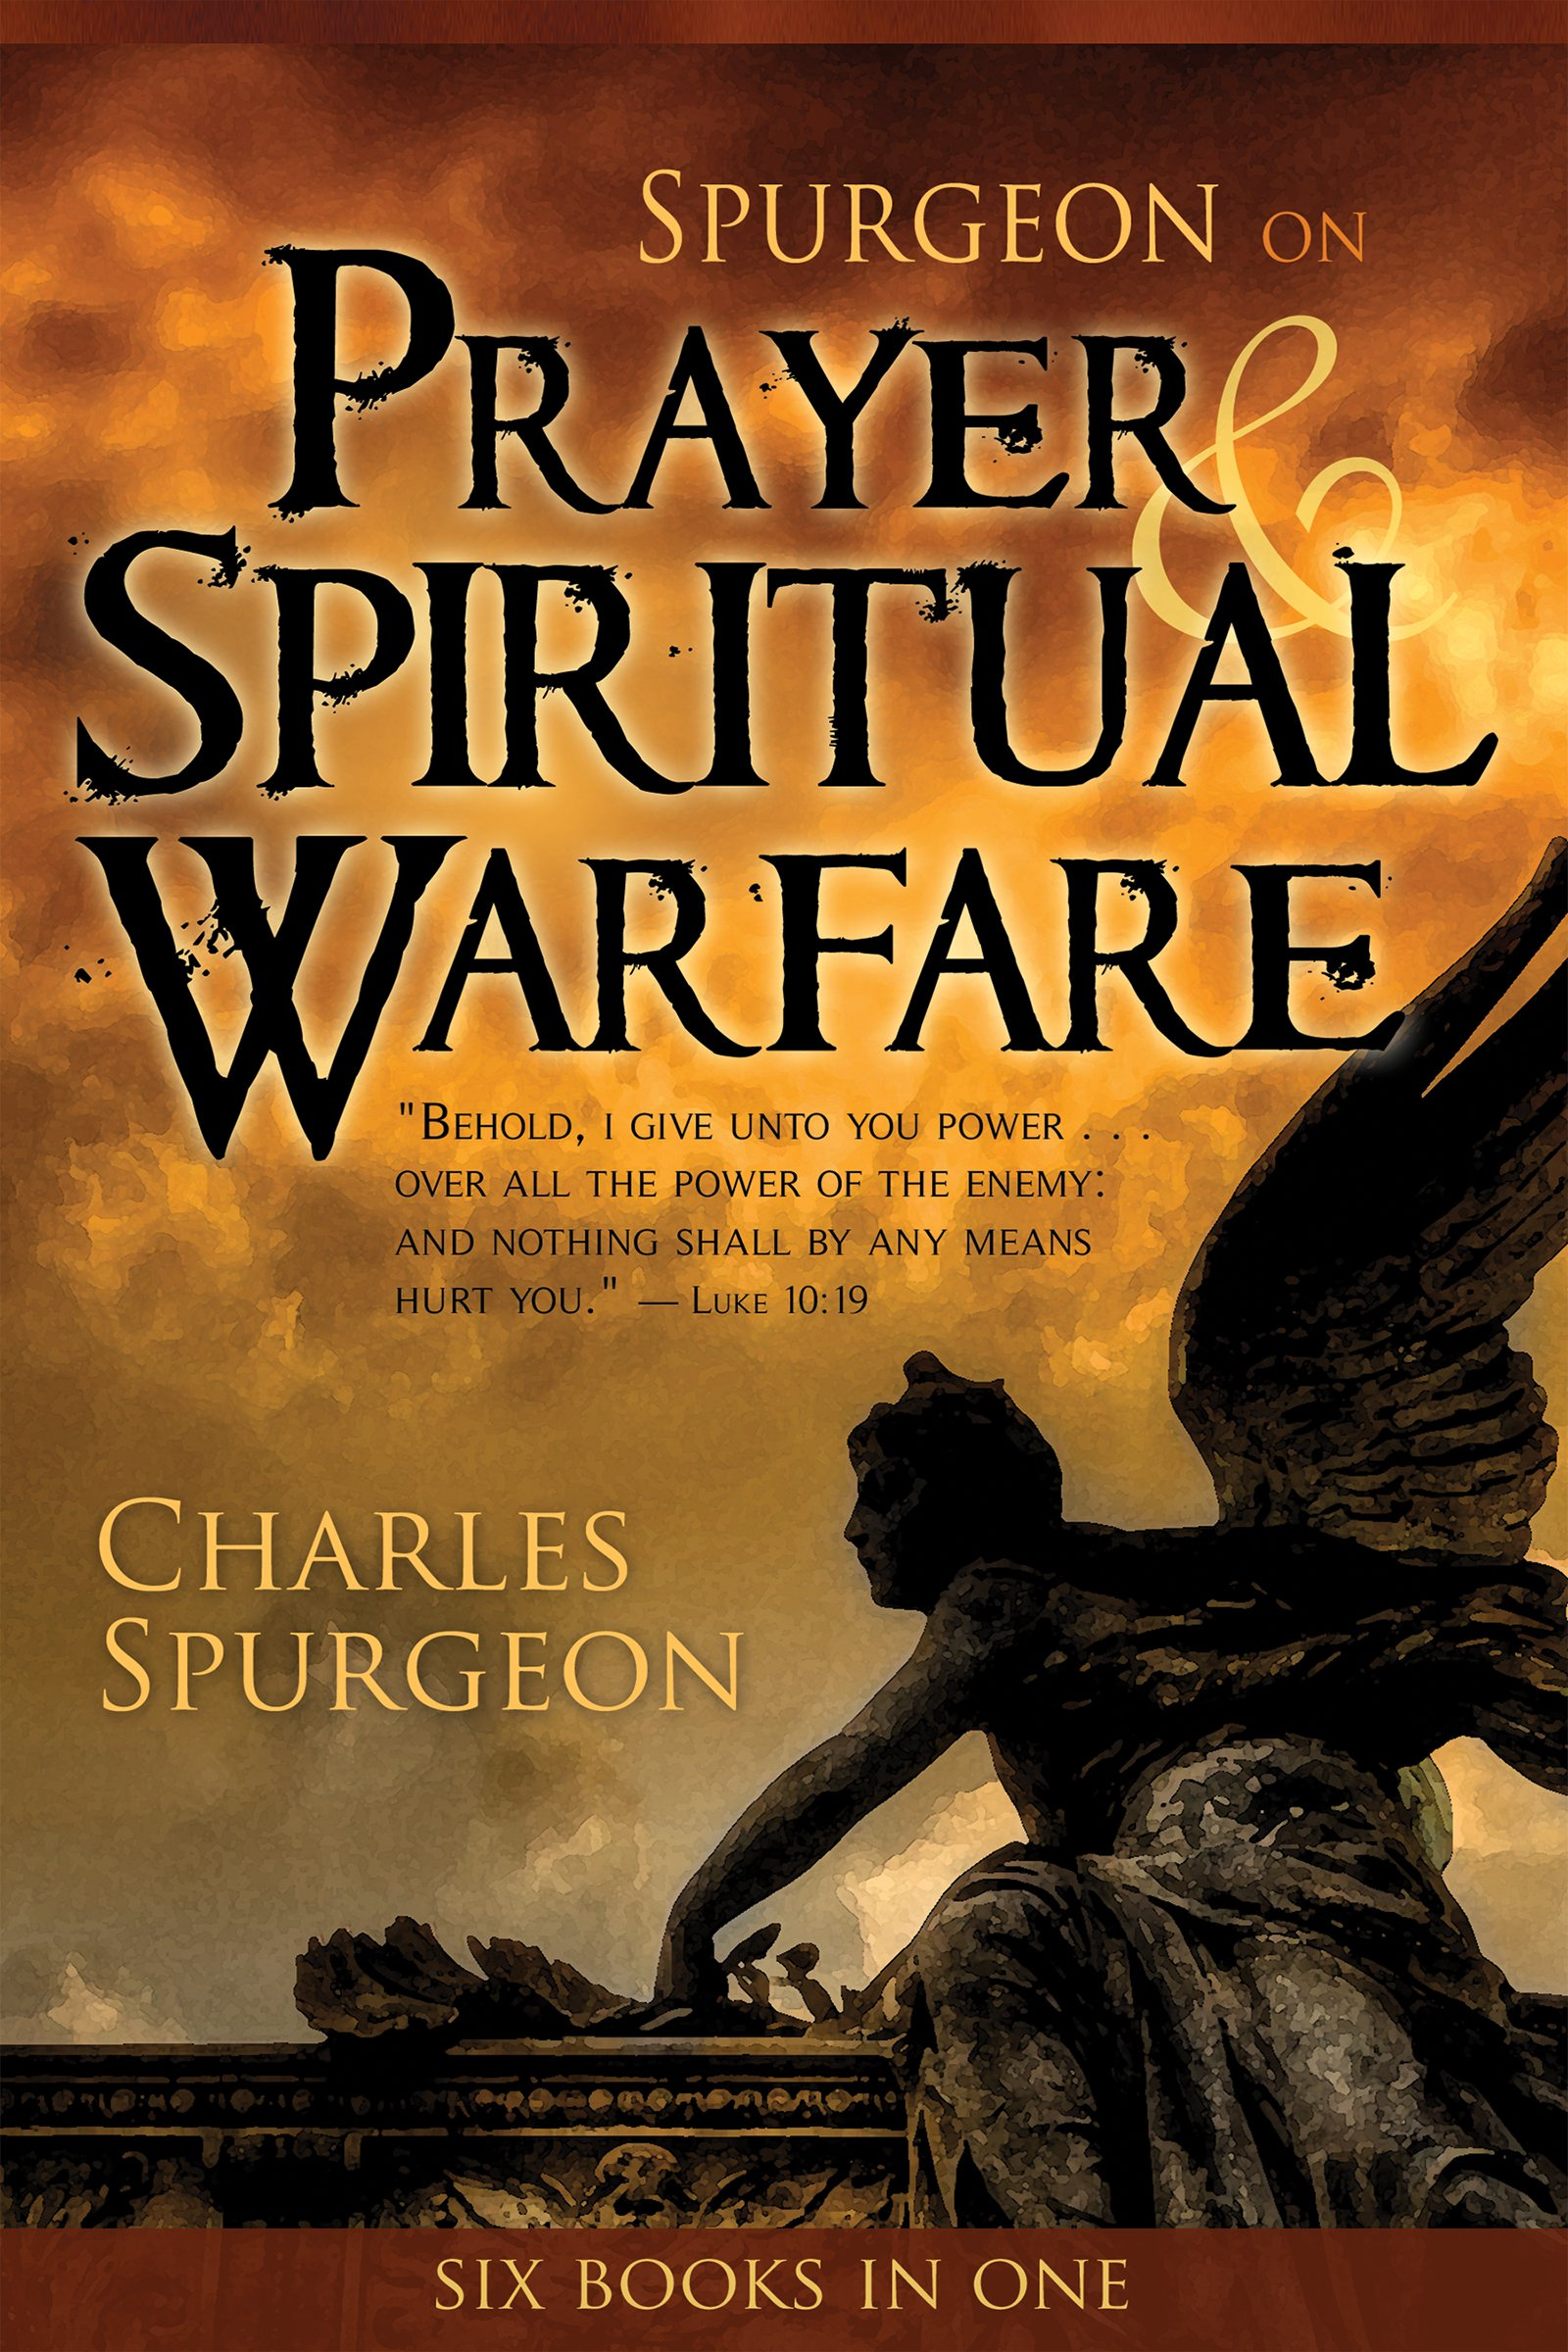 Spurgeon on Prayer & Spiritual Warfare: Charles H Spurgeon